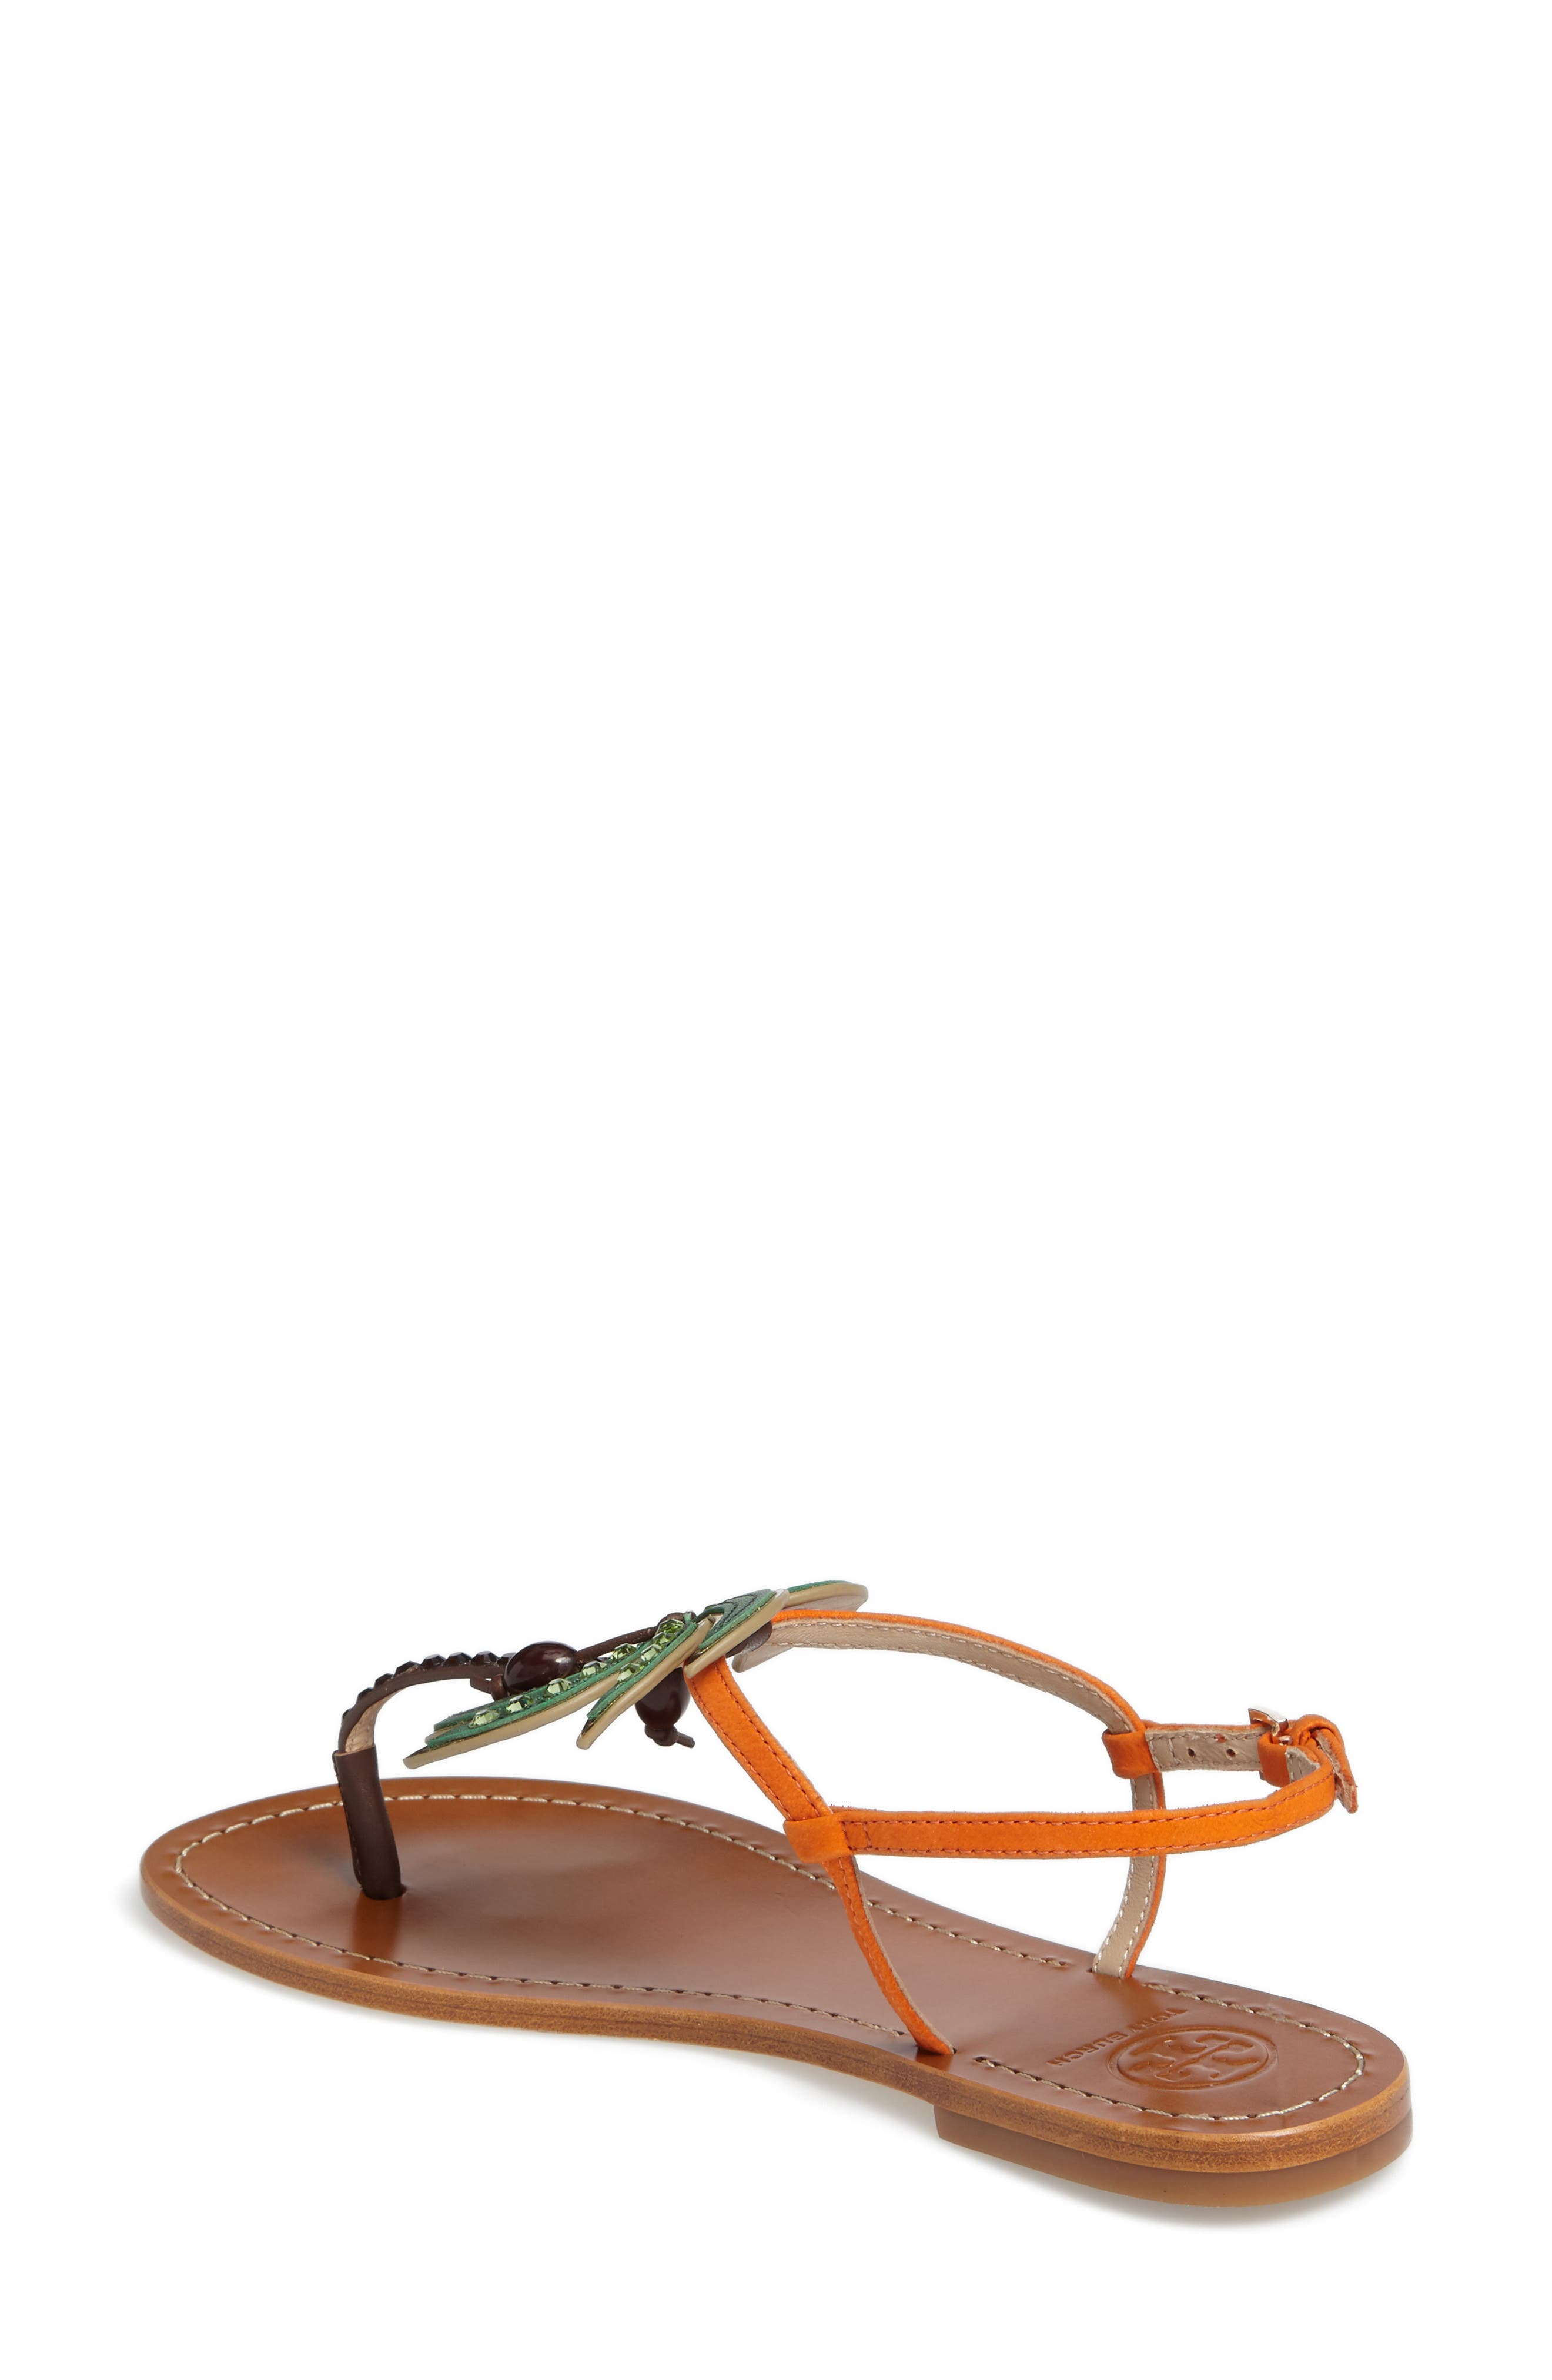 Alternate Image 2  - Tory Burch Castaway Embellished Palm Tree Sandal (Women)